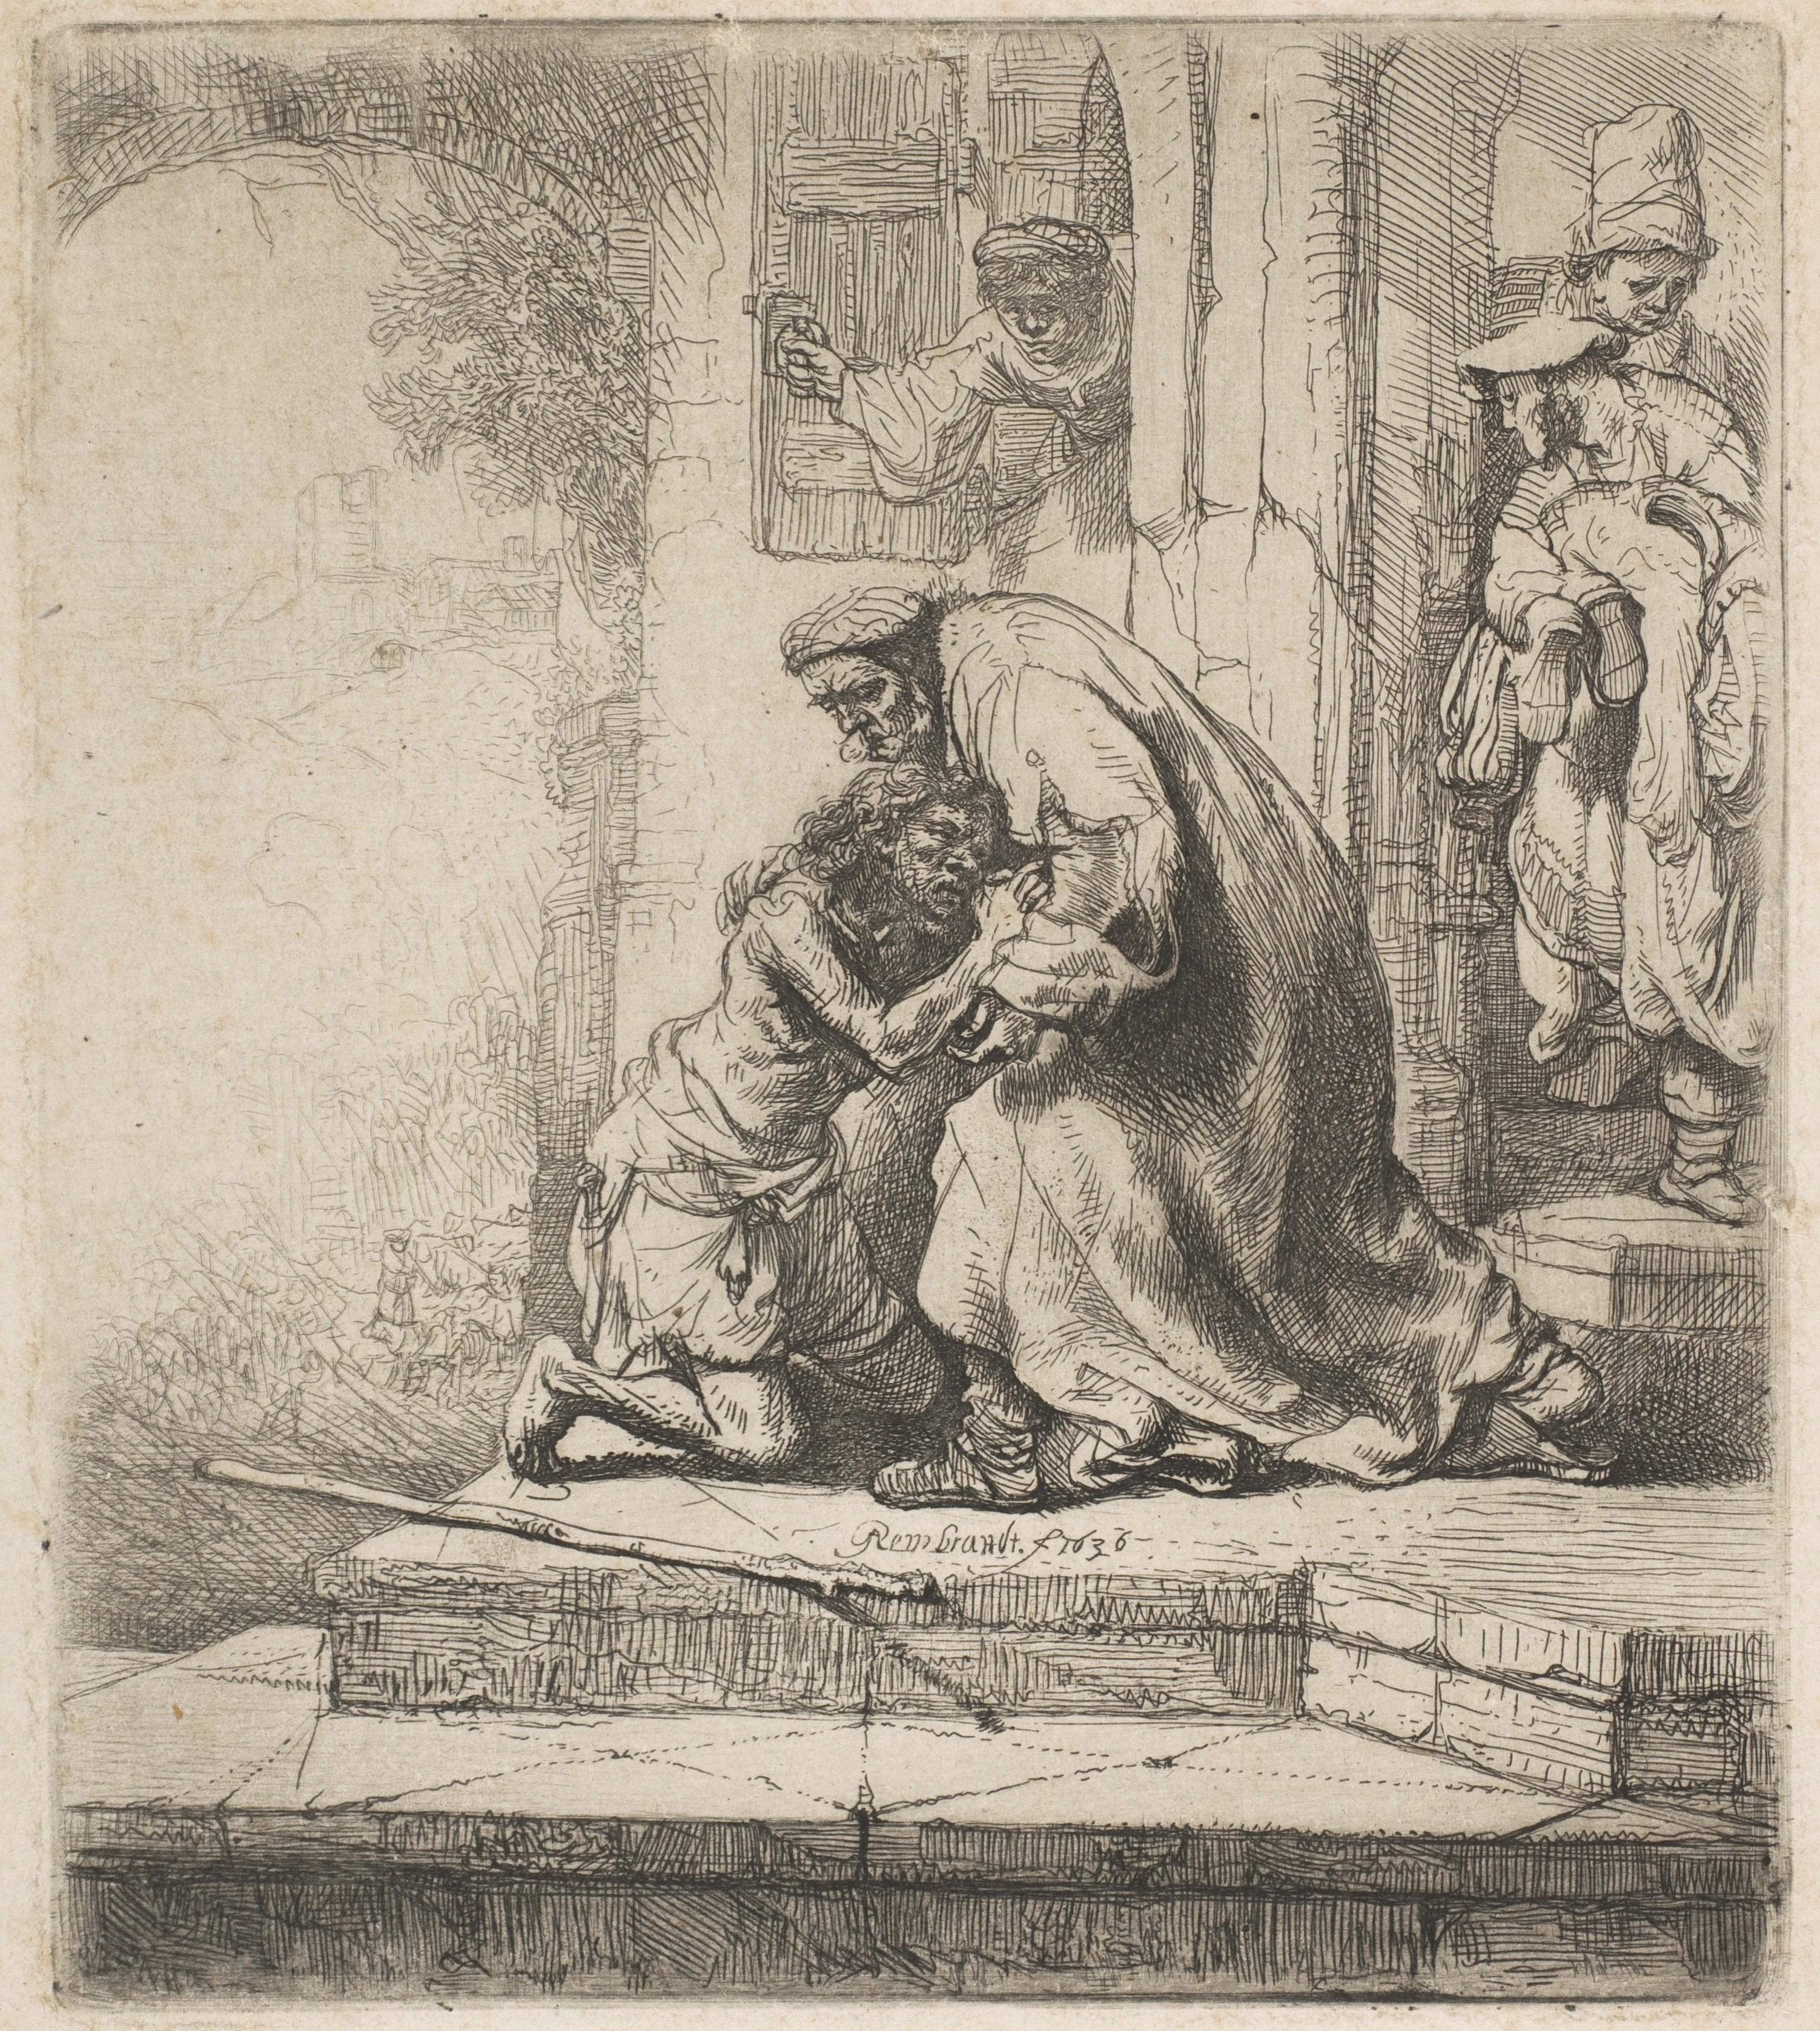 Rembrandt Rembrandt Van Rijn The Return Of The Prodigal Son The Met